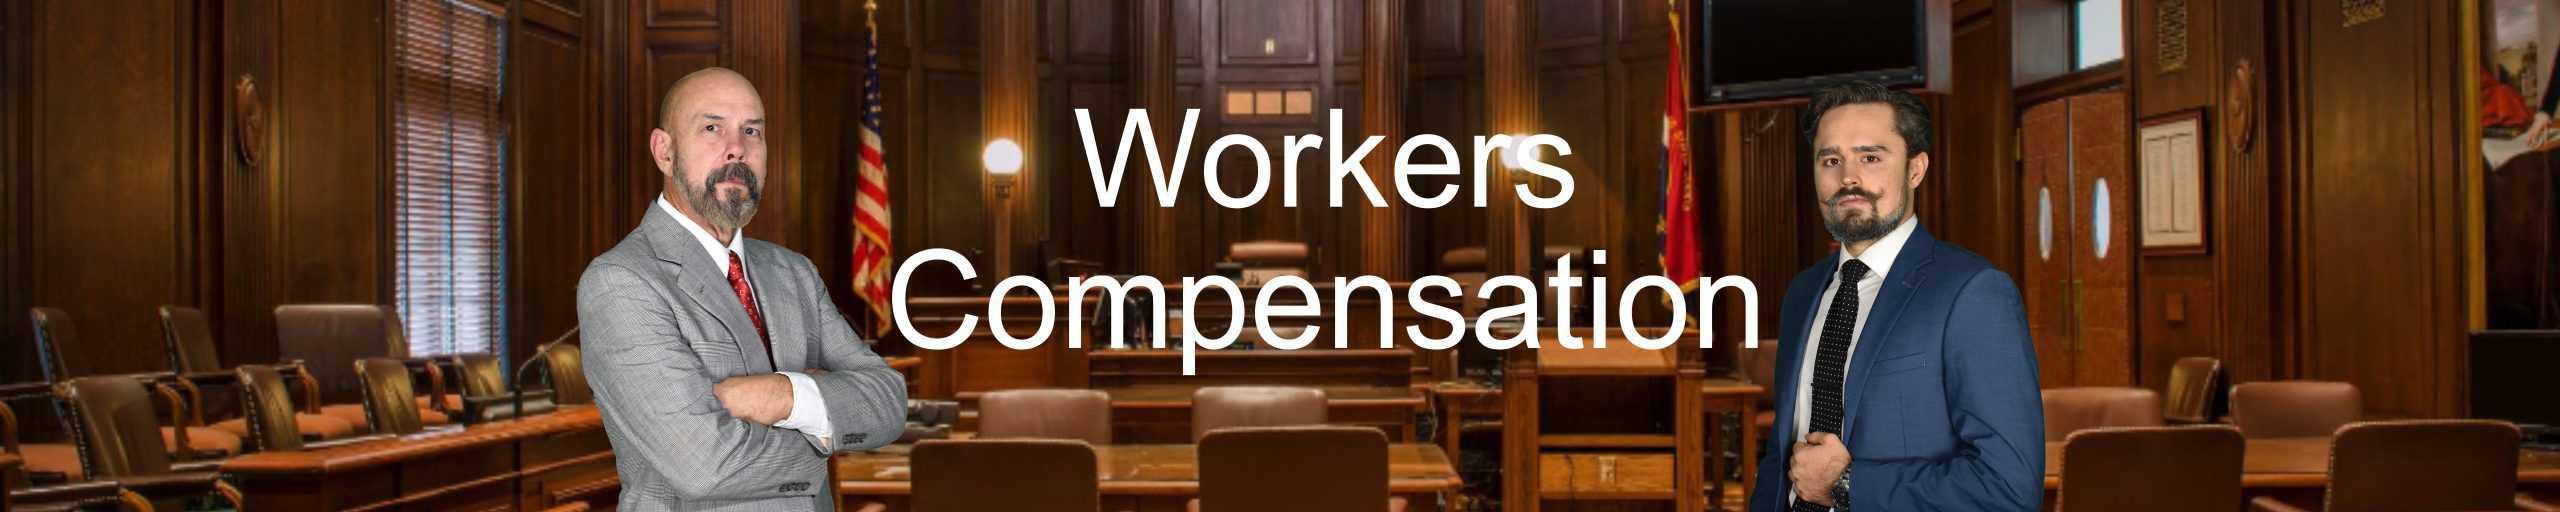 Workers-Compensation-Accident-Injury-Hurt-Damage-Employer-Slip-Accident-Broken-Lost